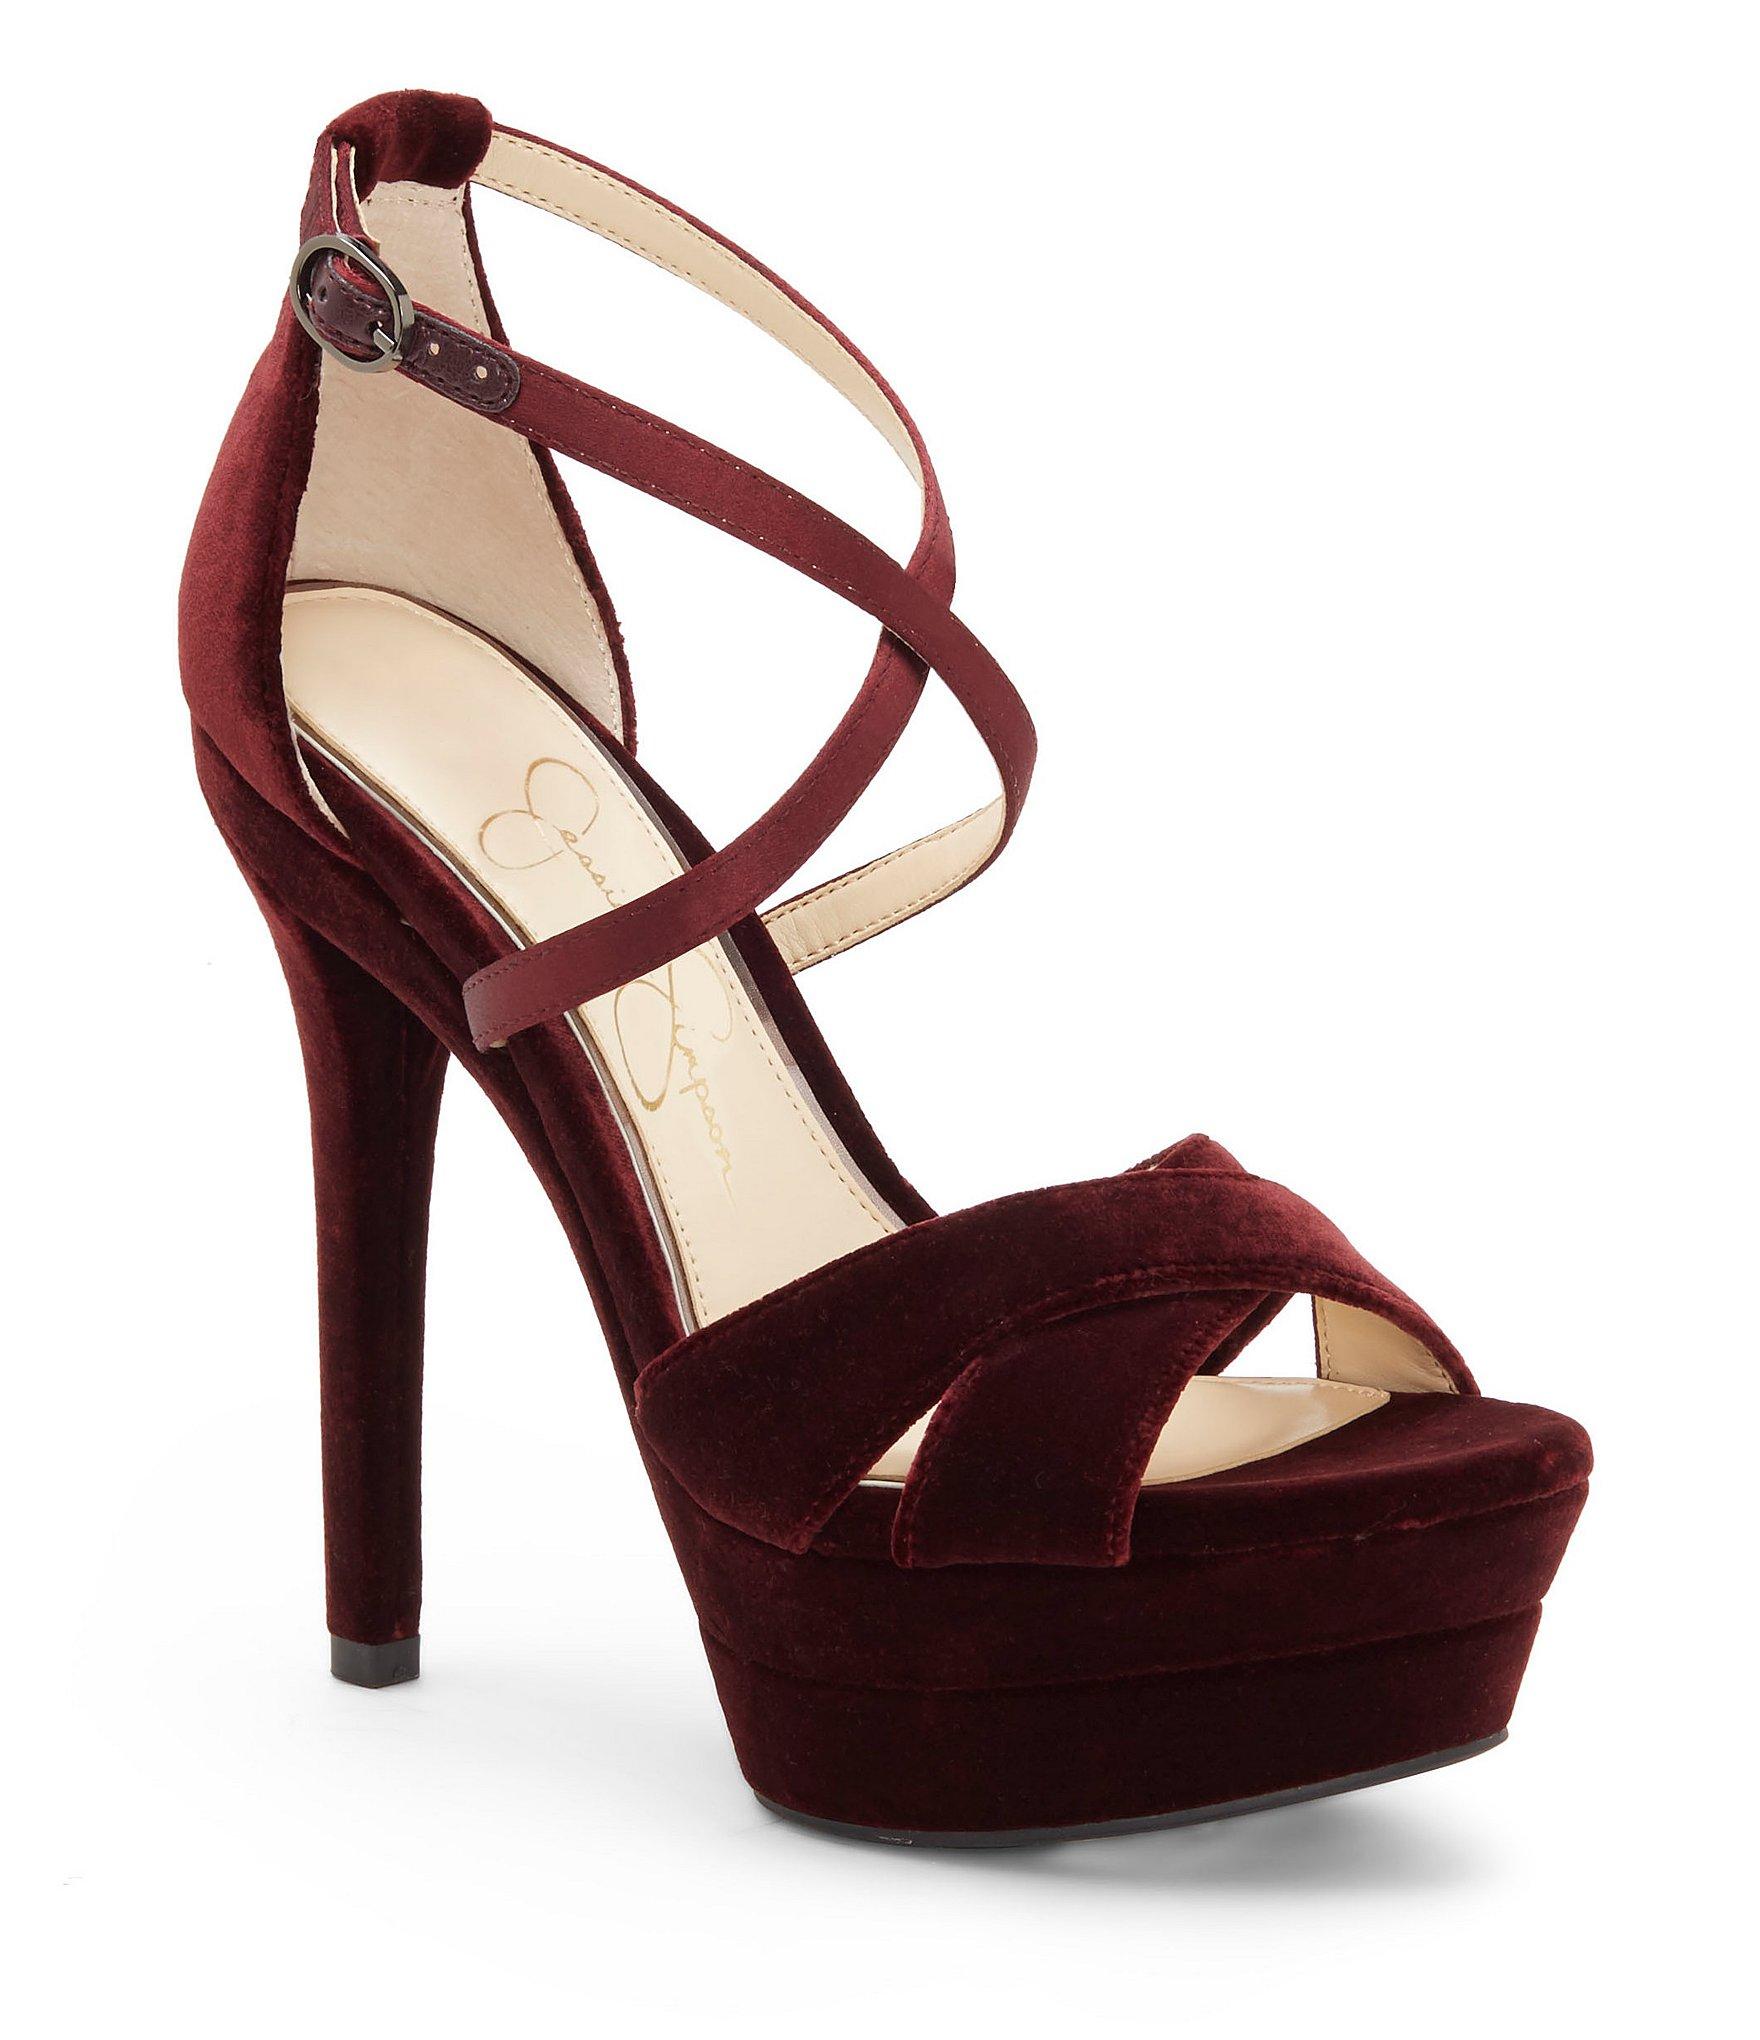 Jessica Simpson Shoes Sale Dillards